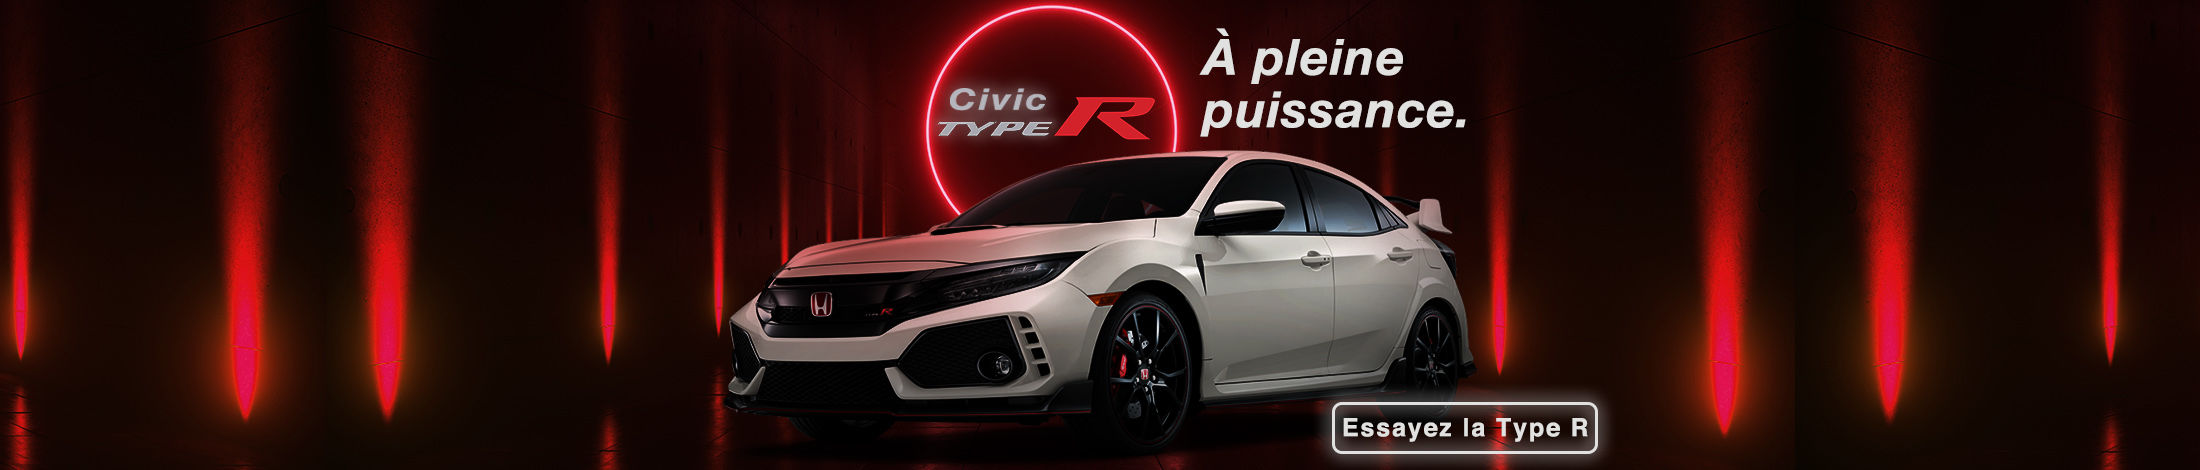 Civic Type R 2019